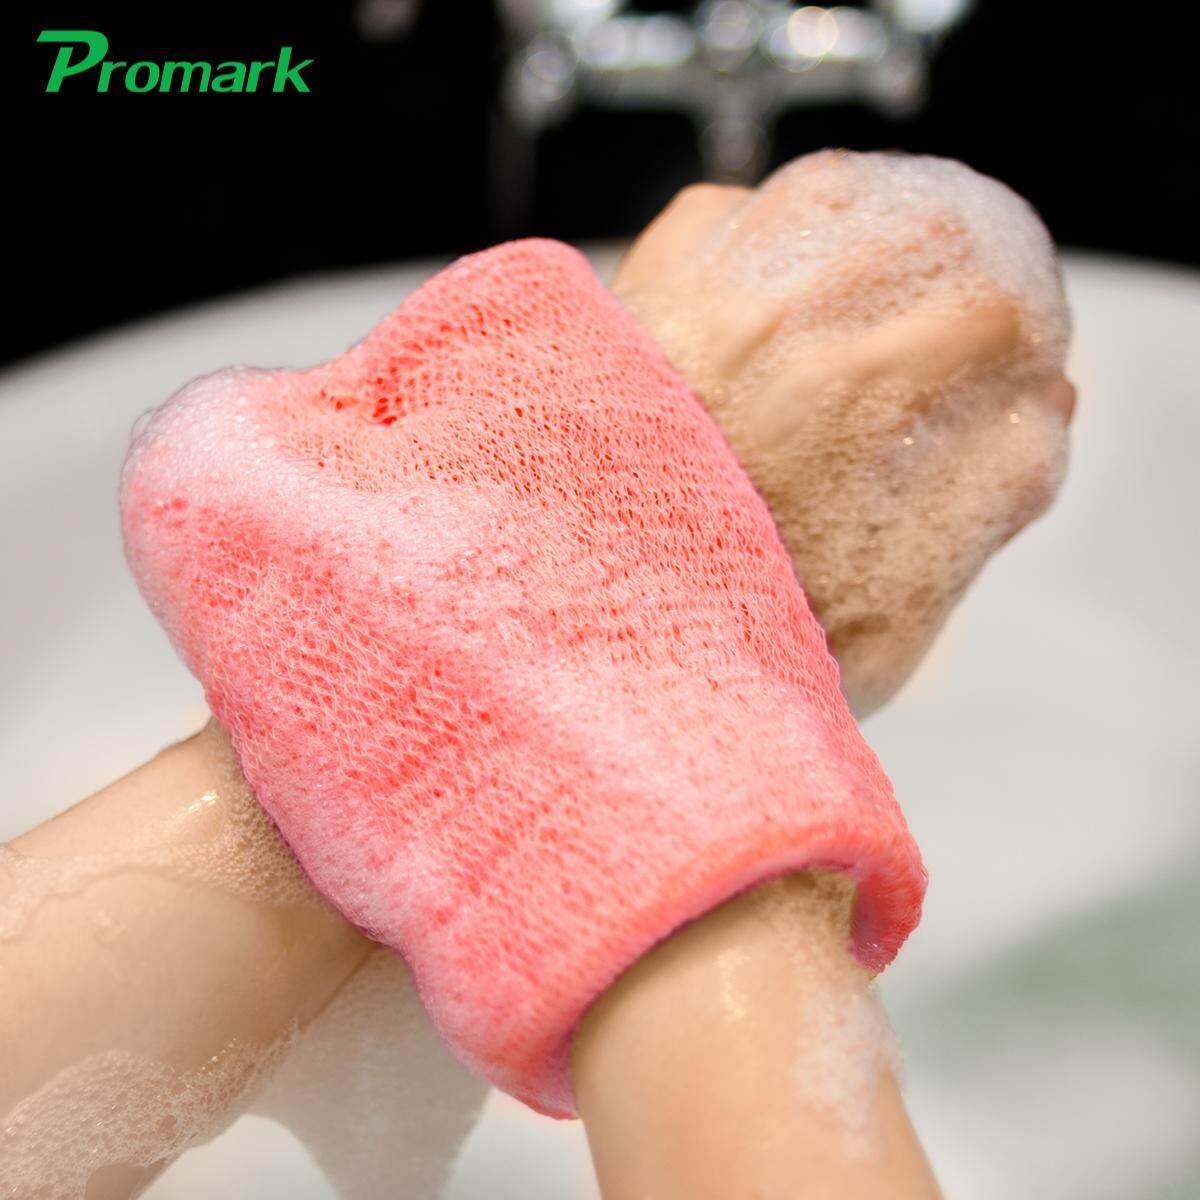 Promark ใยถูตัว ใยขัดผิวคละแบบ 1 ชิ้น Bath Shower Loofah By Promark Sports.